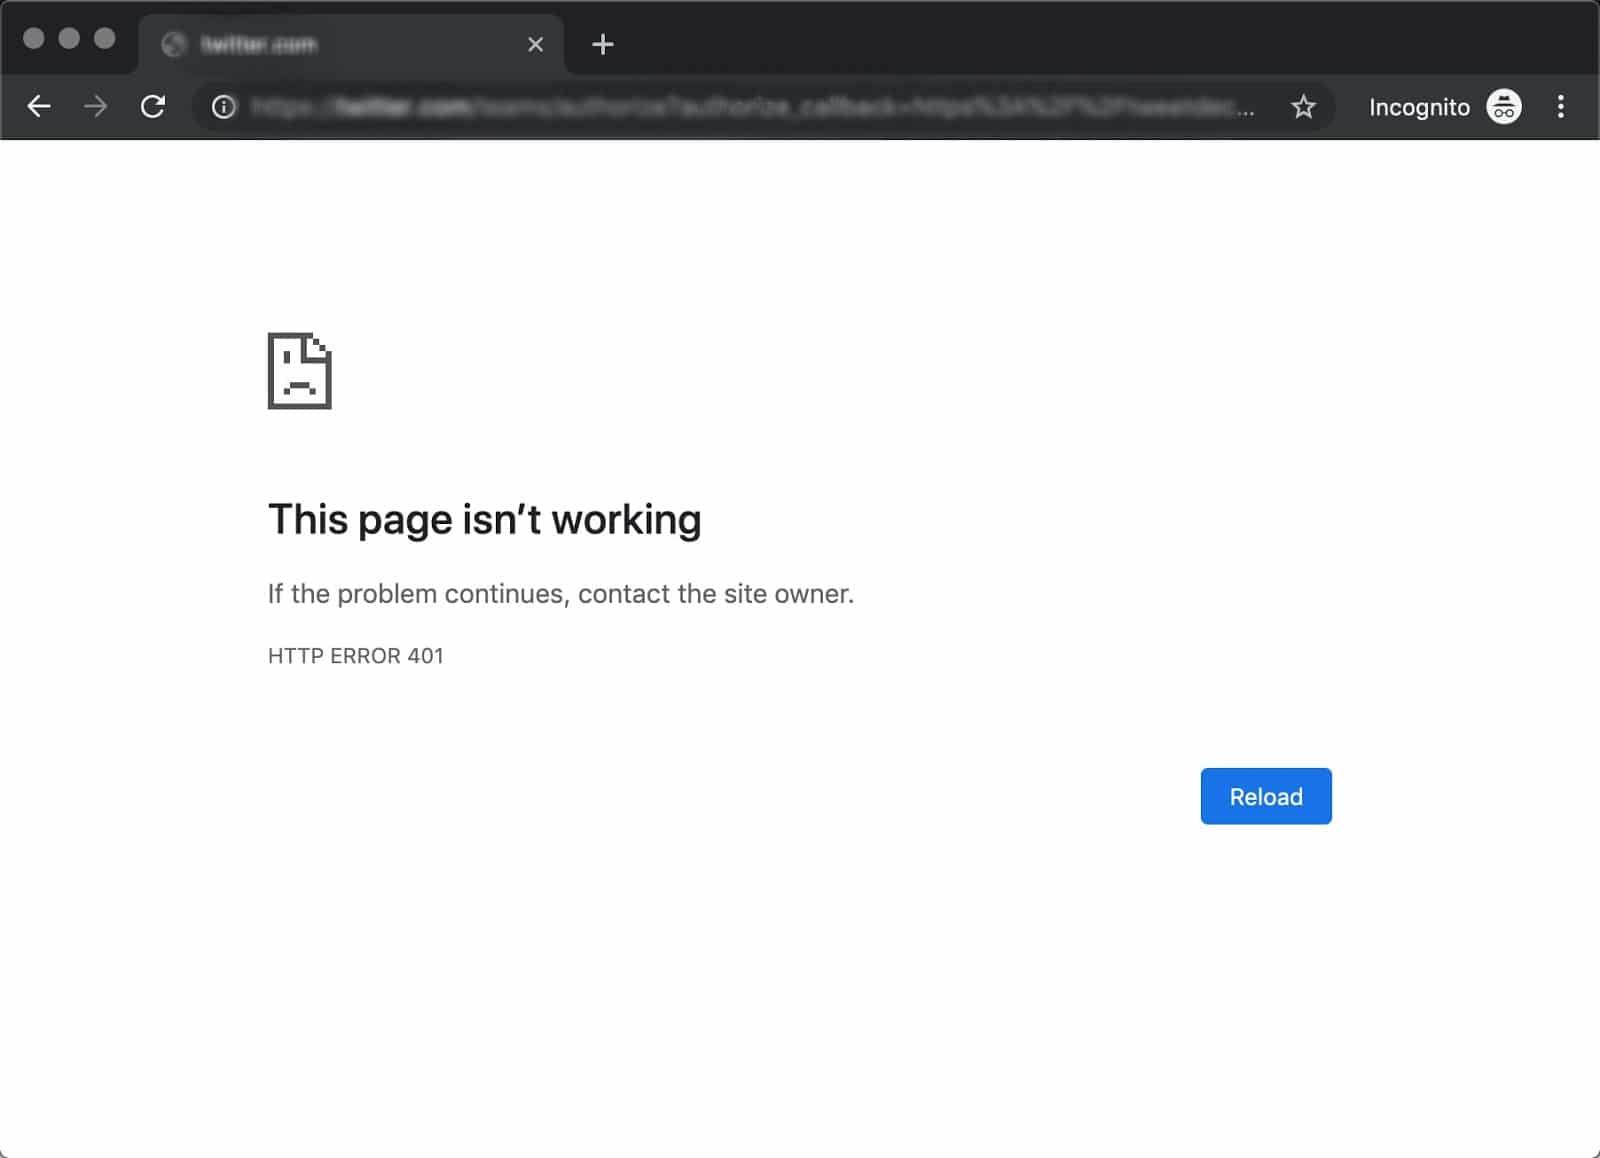 L'errore 401 in Chrome